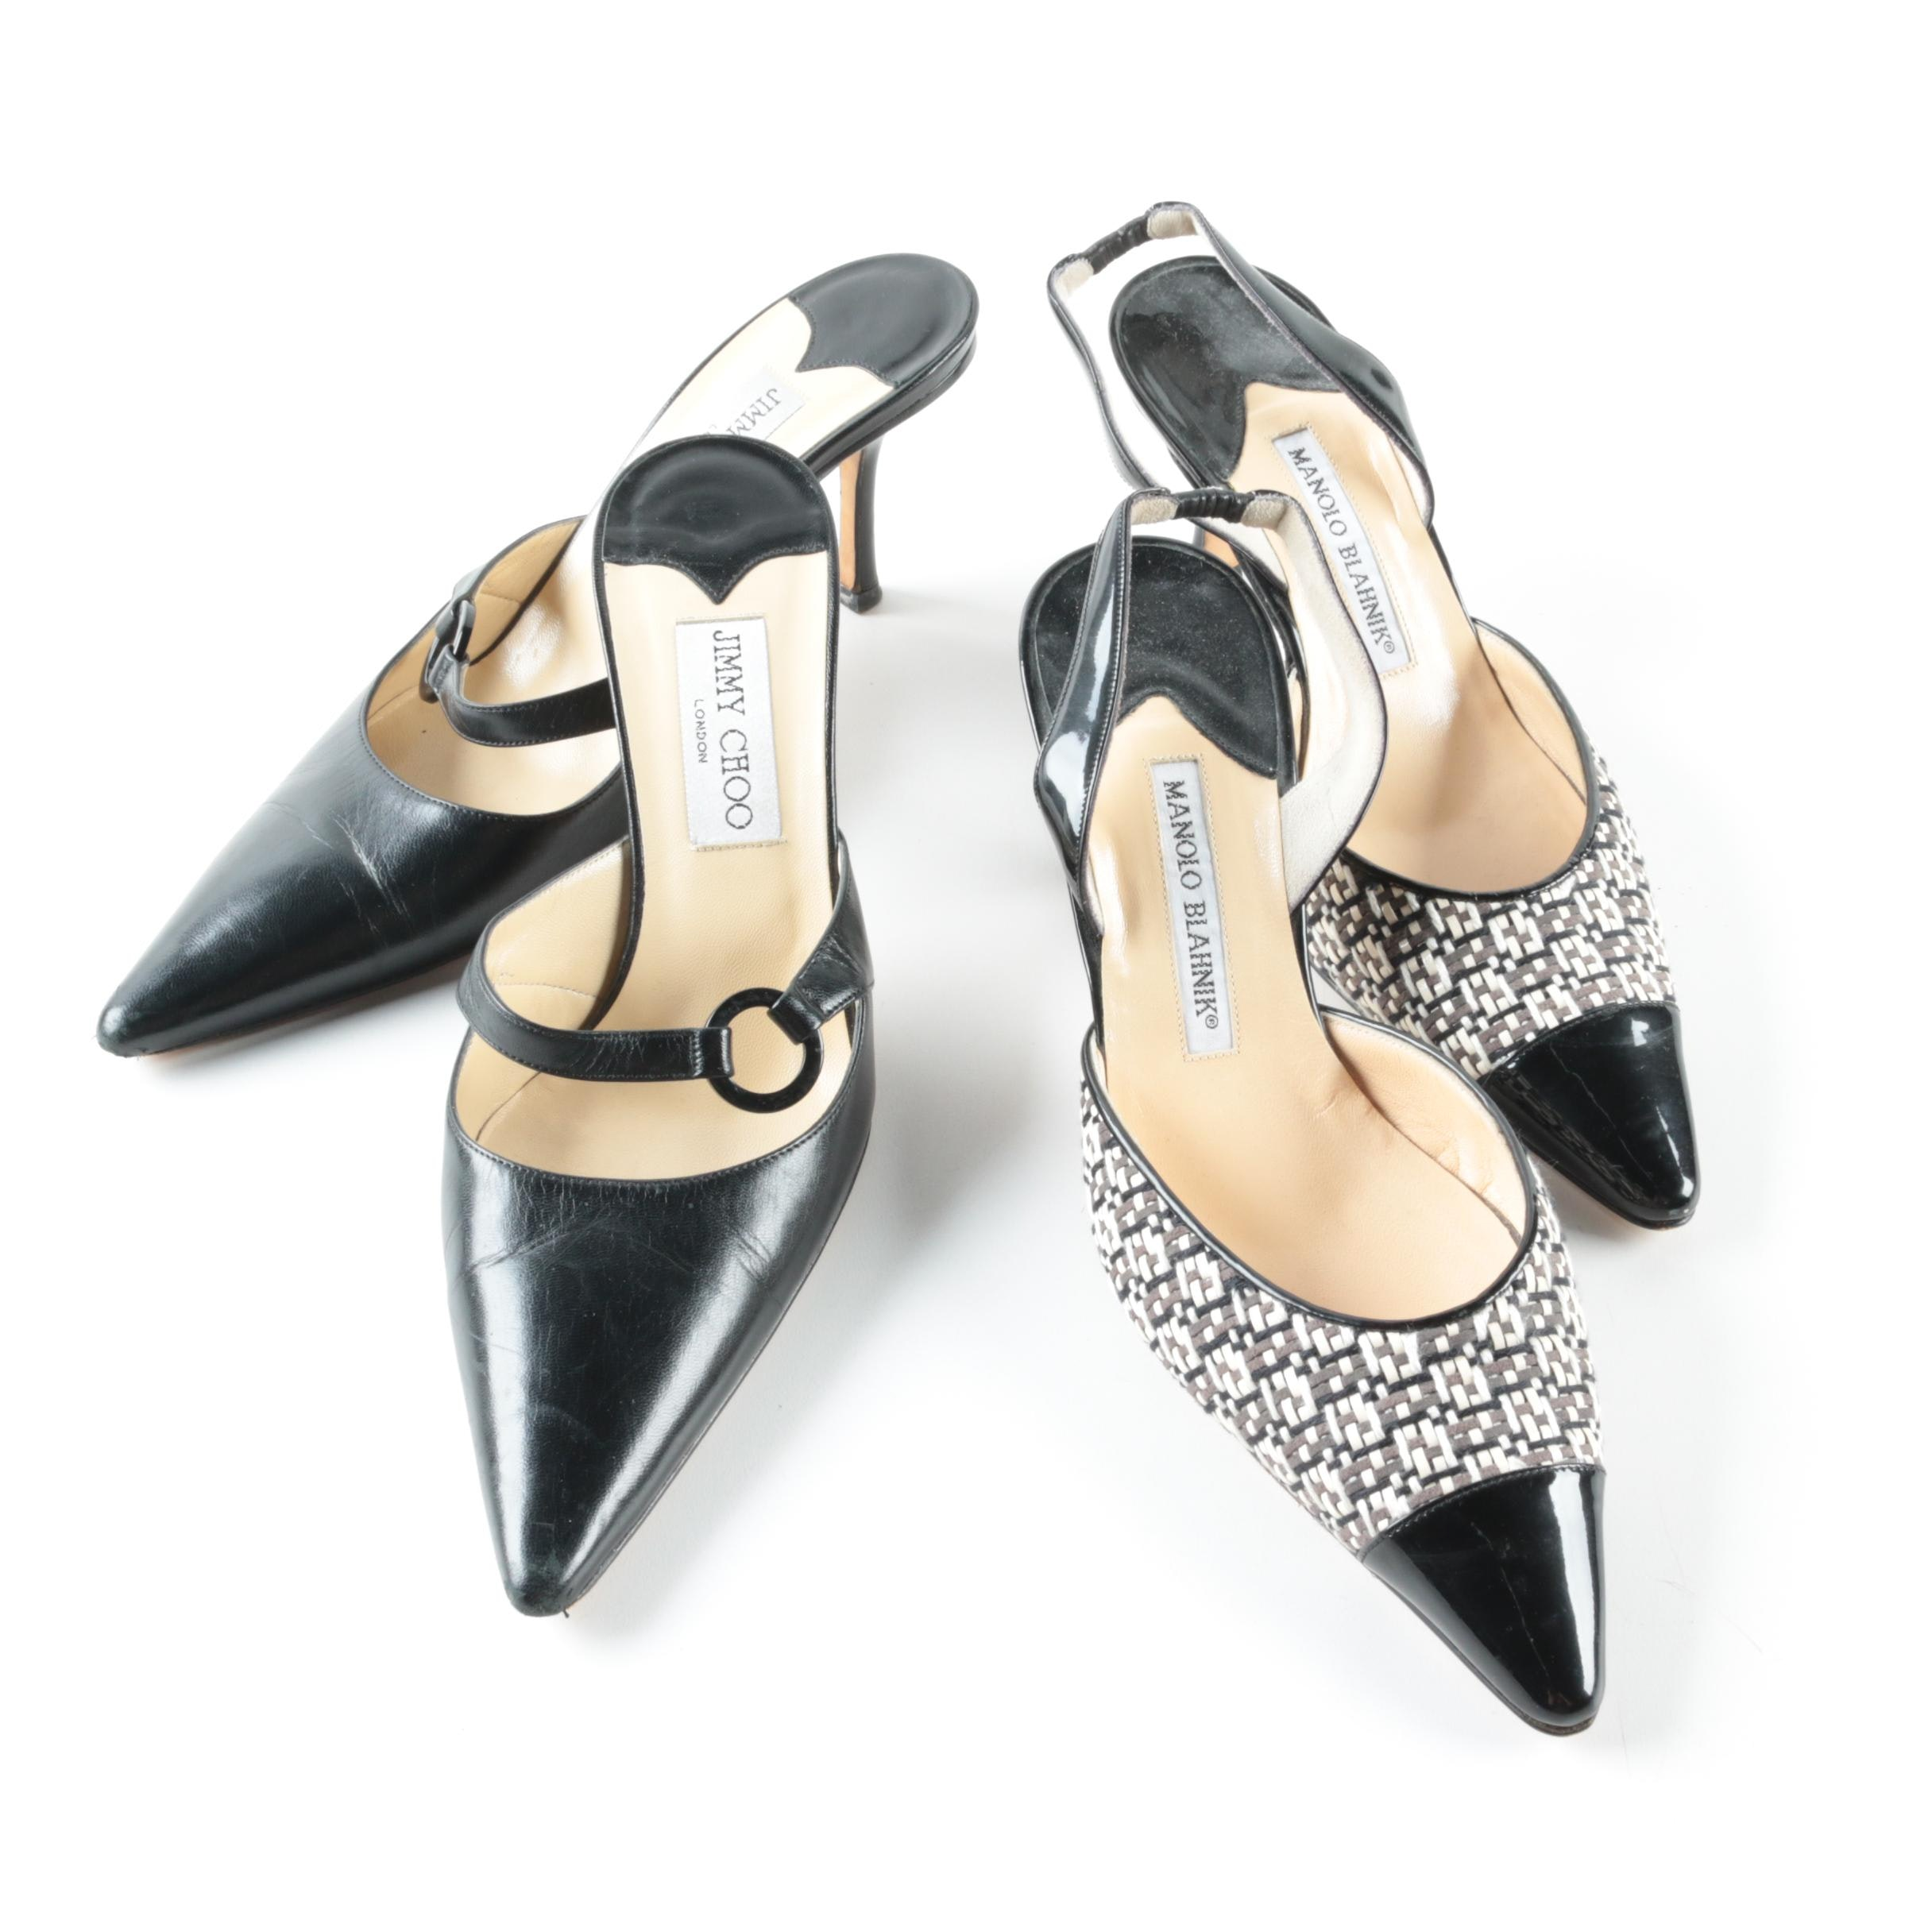 Jimmy Choo Black Leather Kitten Heels and Manolo Blahnik Slingback Heels